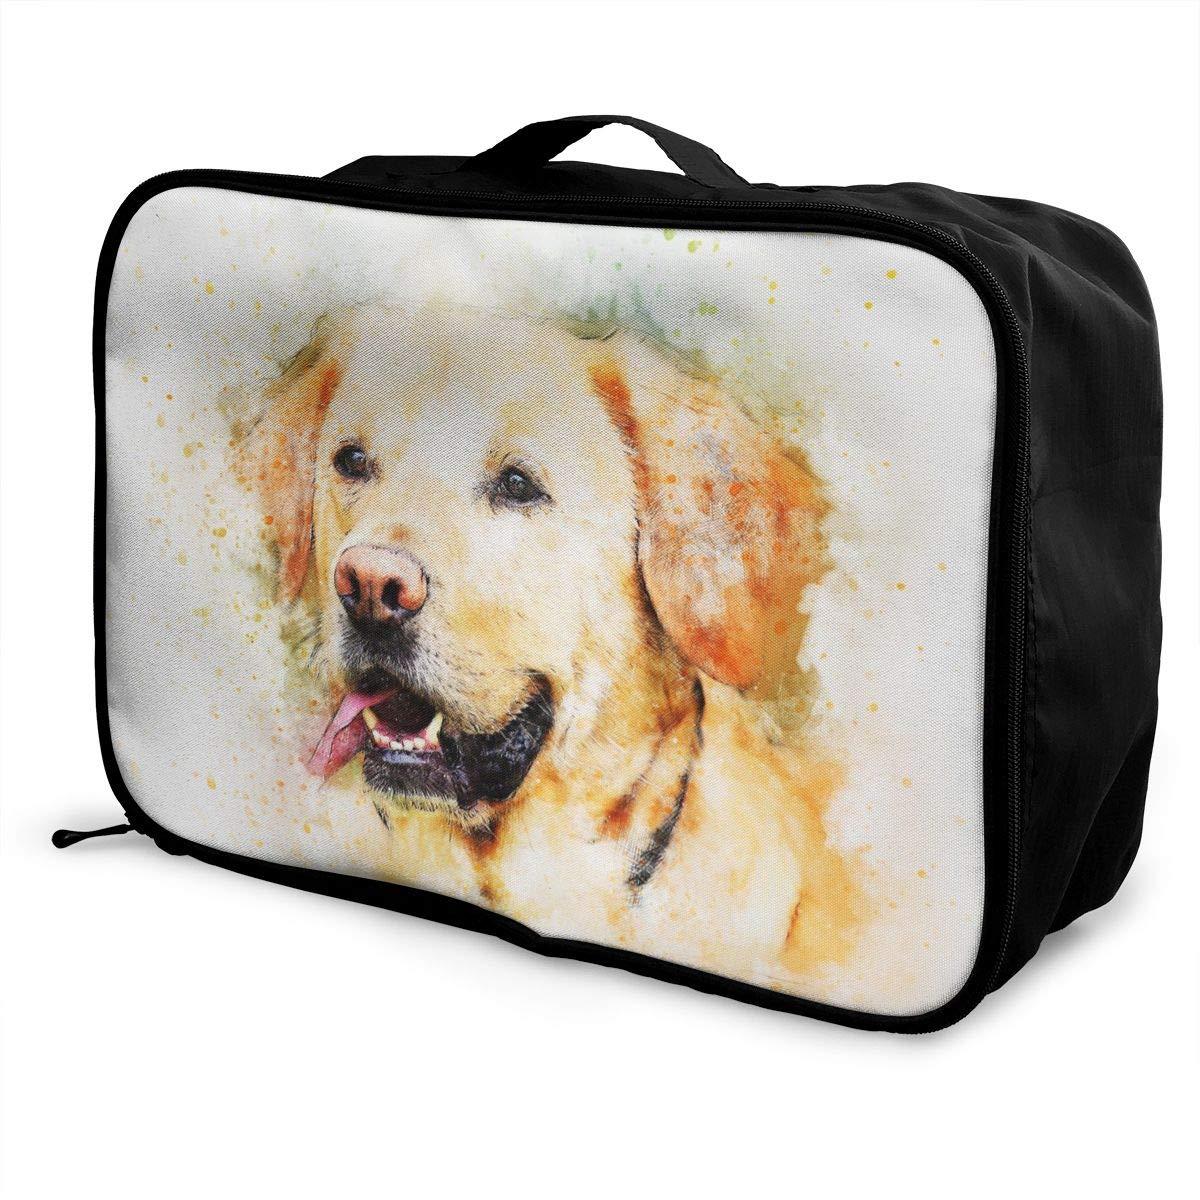 Animal Art Watercolor Pet Travel Lightweight Waterproof Foldable Storage Carry Luggage Large Capacity Portable Luggage Bag Duffel Bag